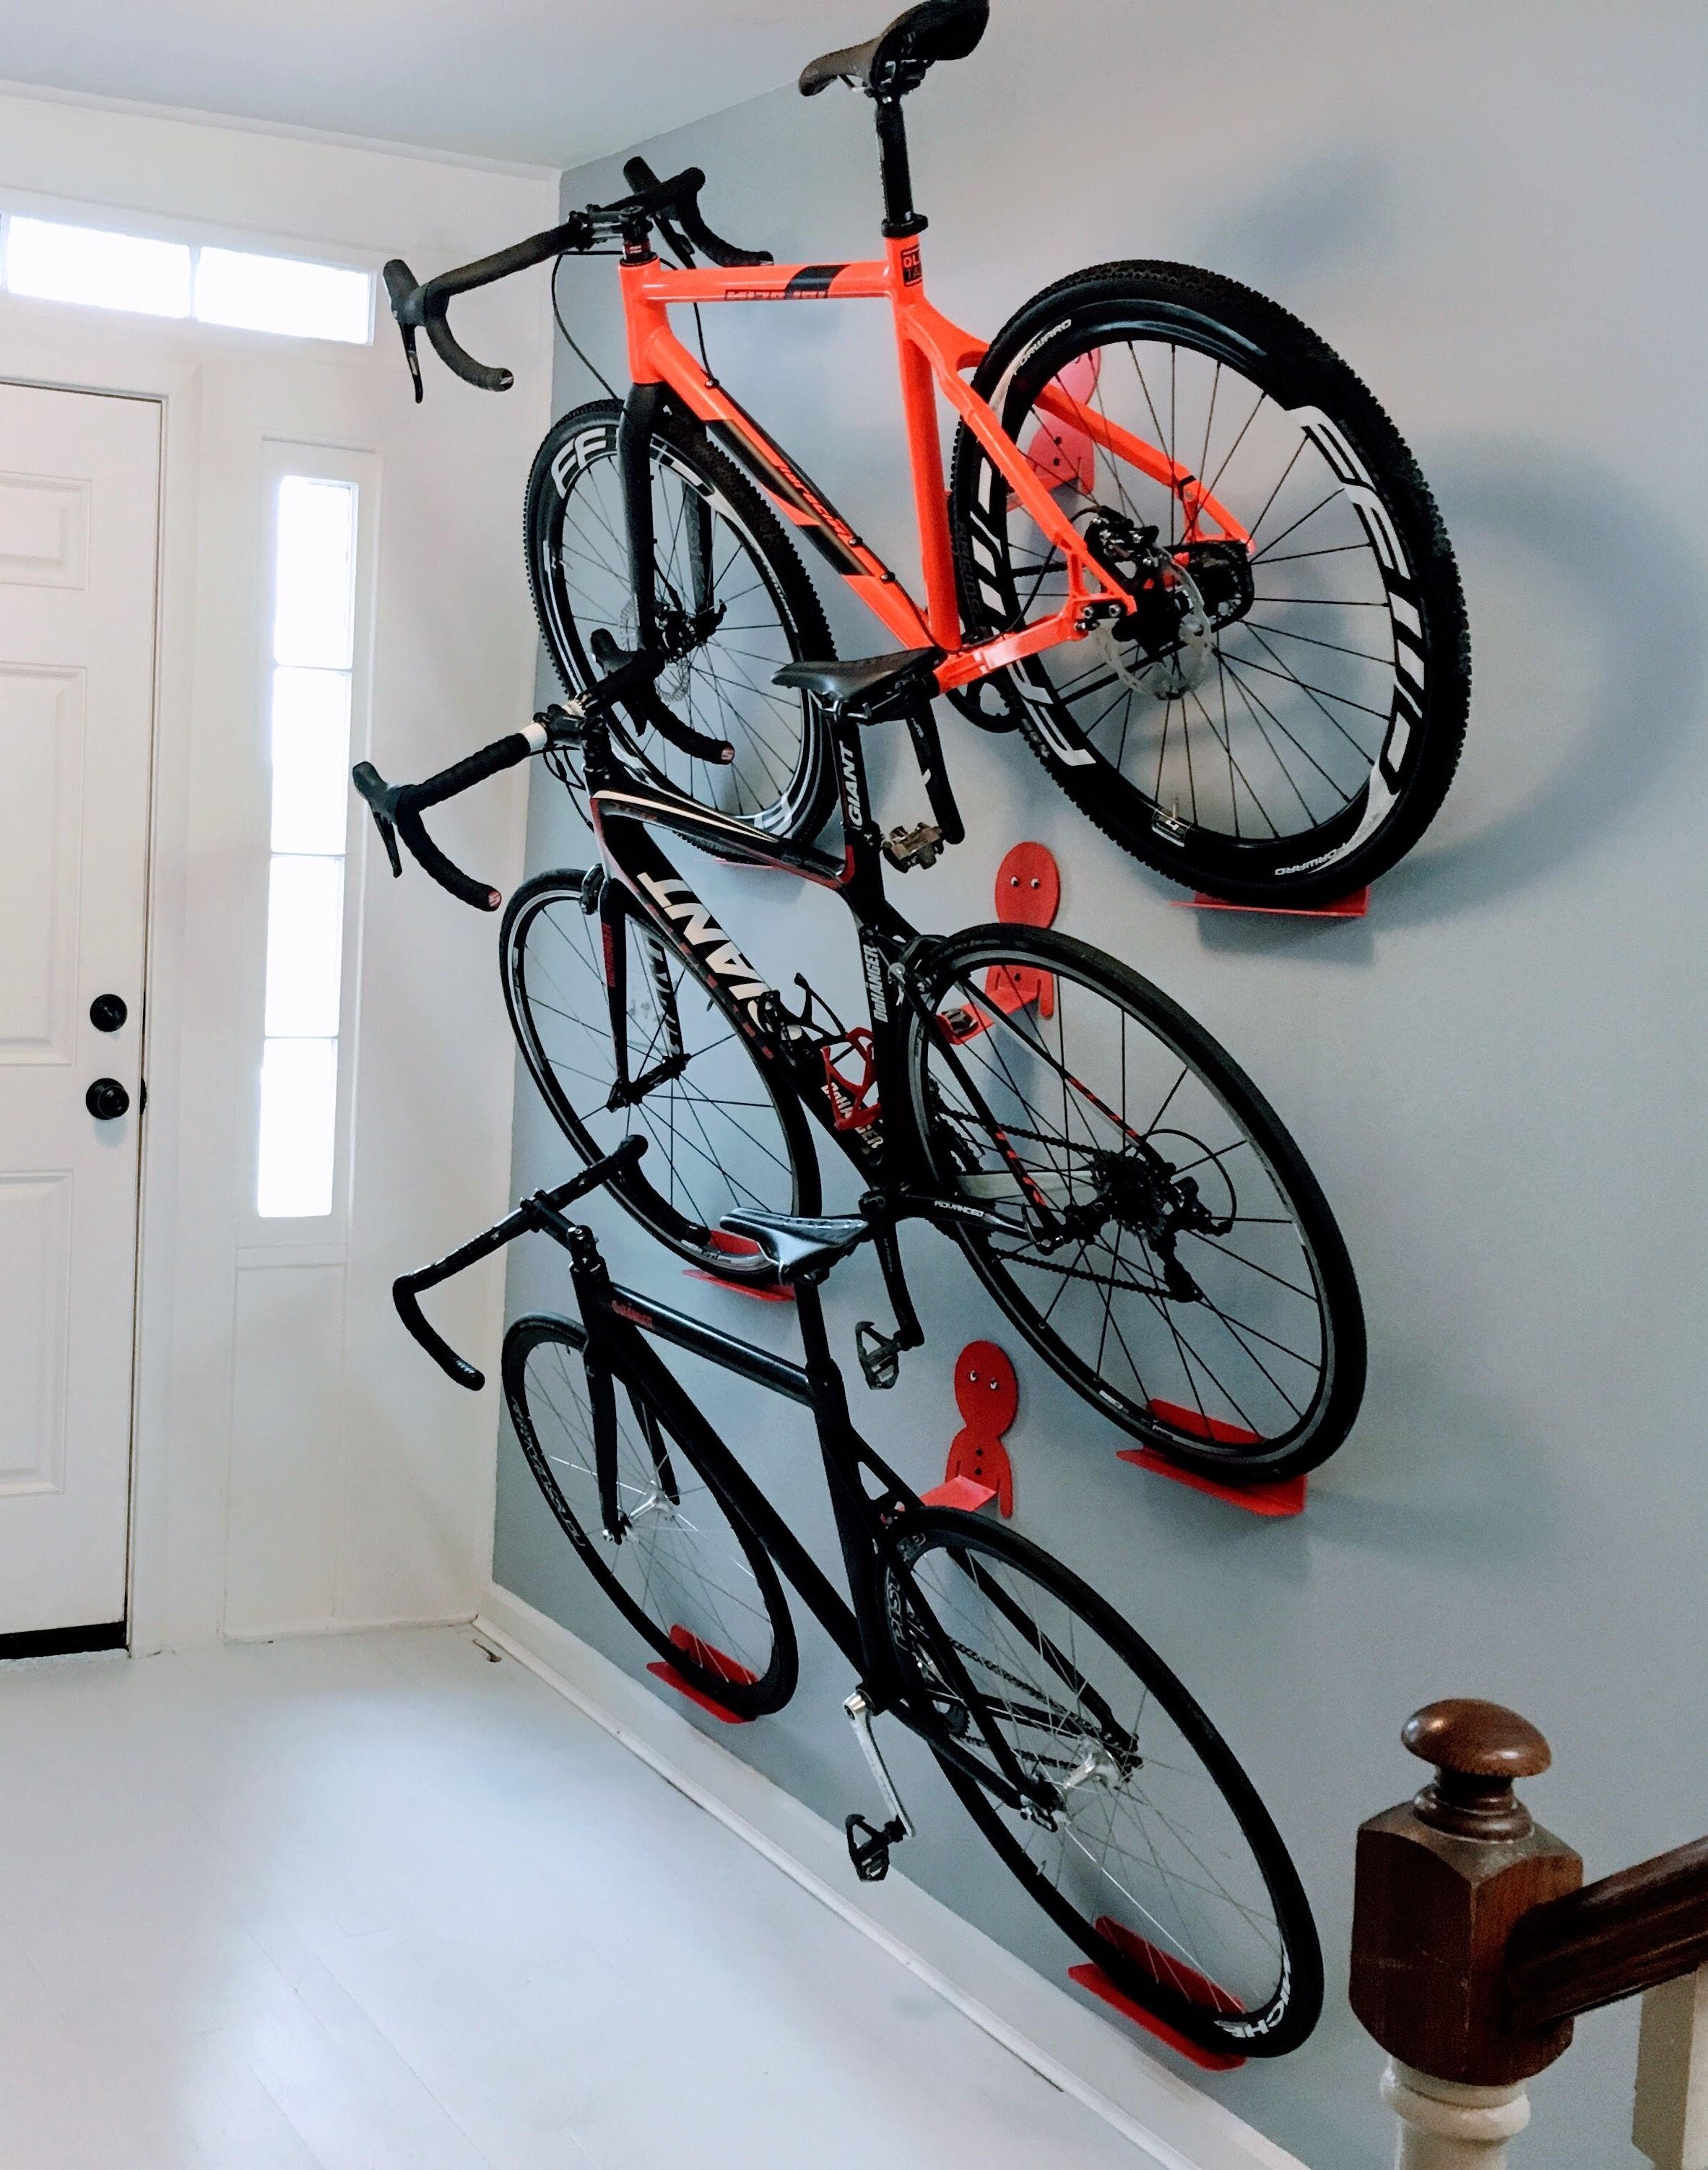 Multiple bikes hanging rack system. DaHANGER Dan pedal